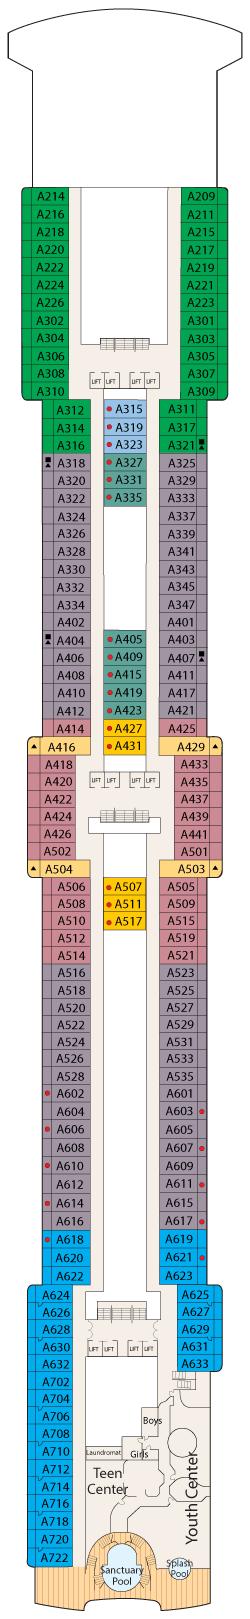 31 Perfect Island Princess Cruise Ship Deck Plan